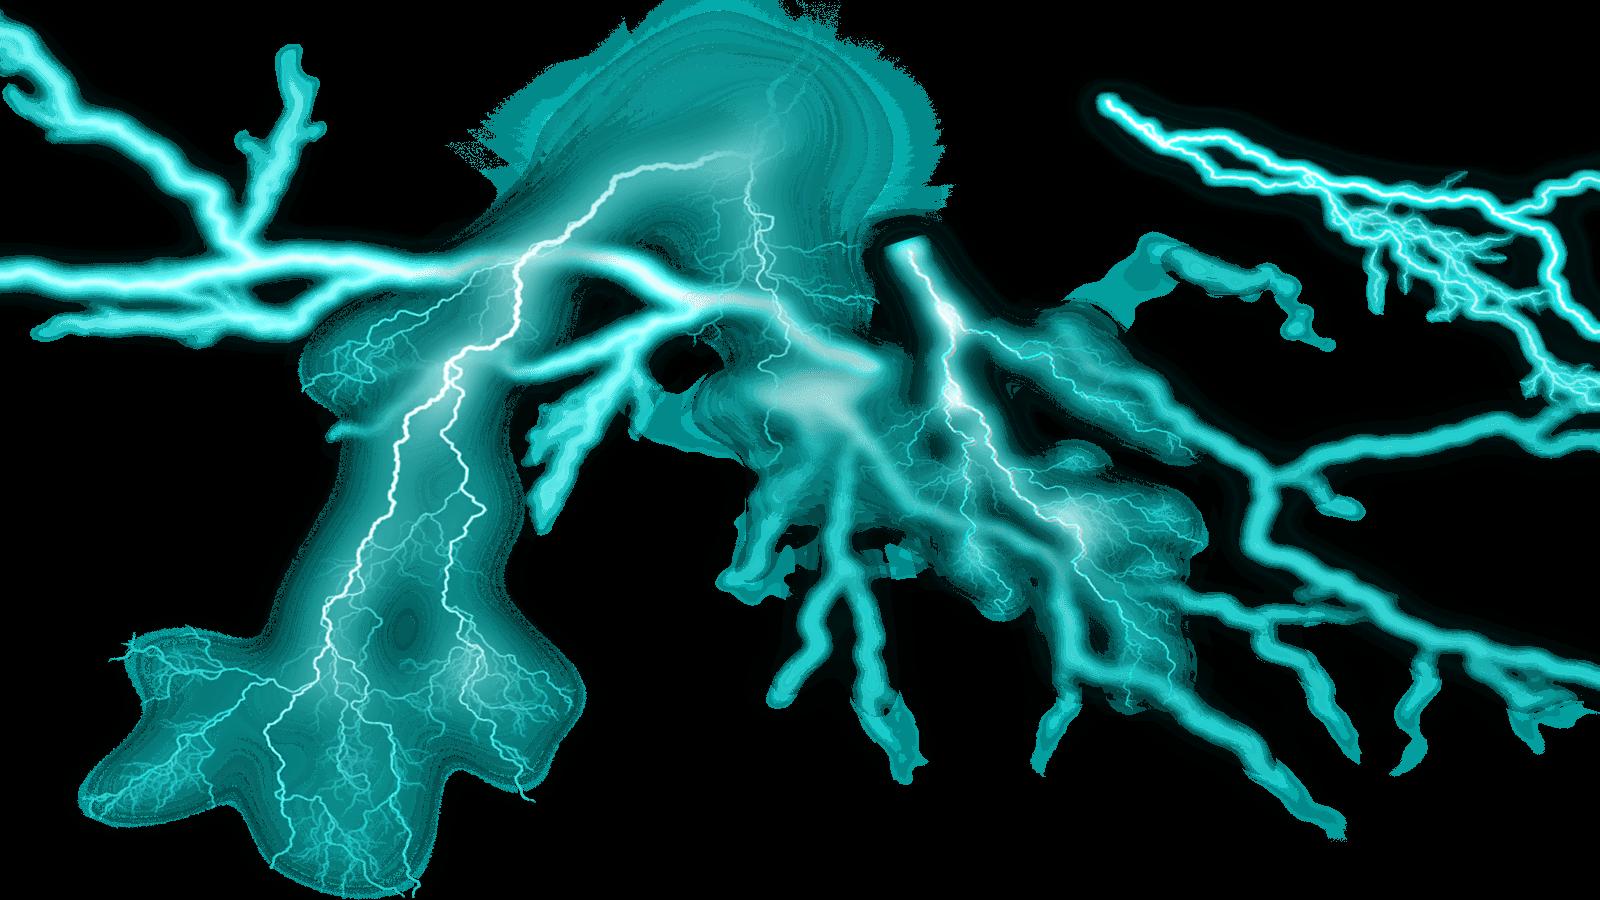 Bright Sparks transparent PNG - StickPNG for Blue Bright Light Png  61obs